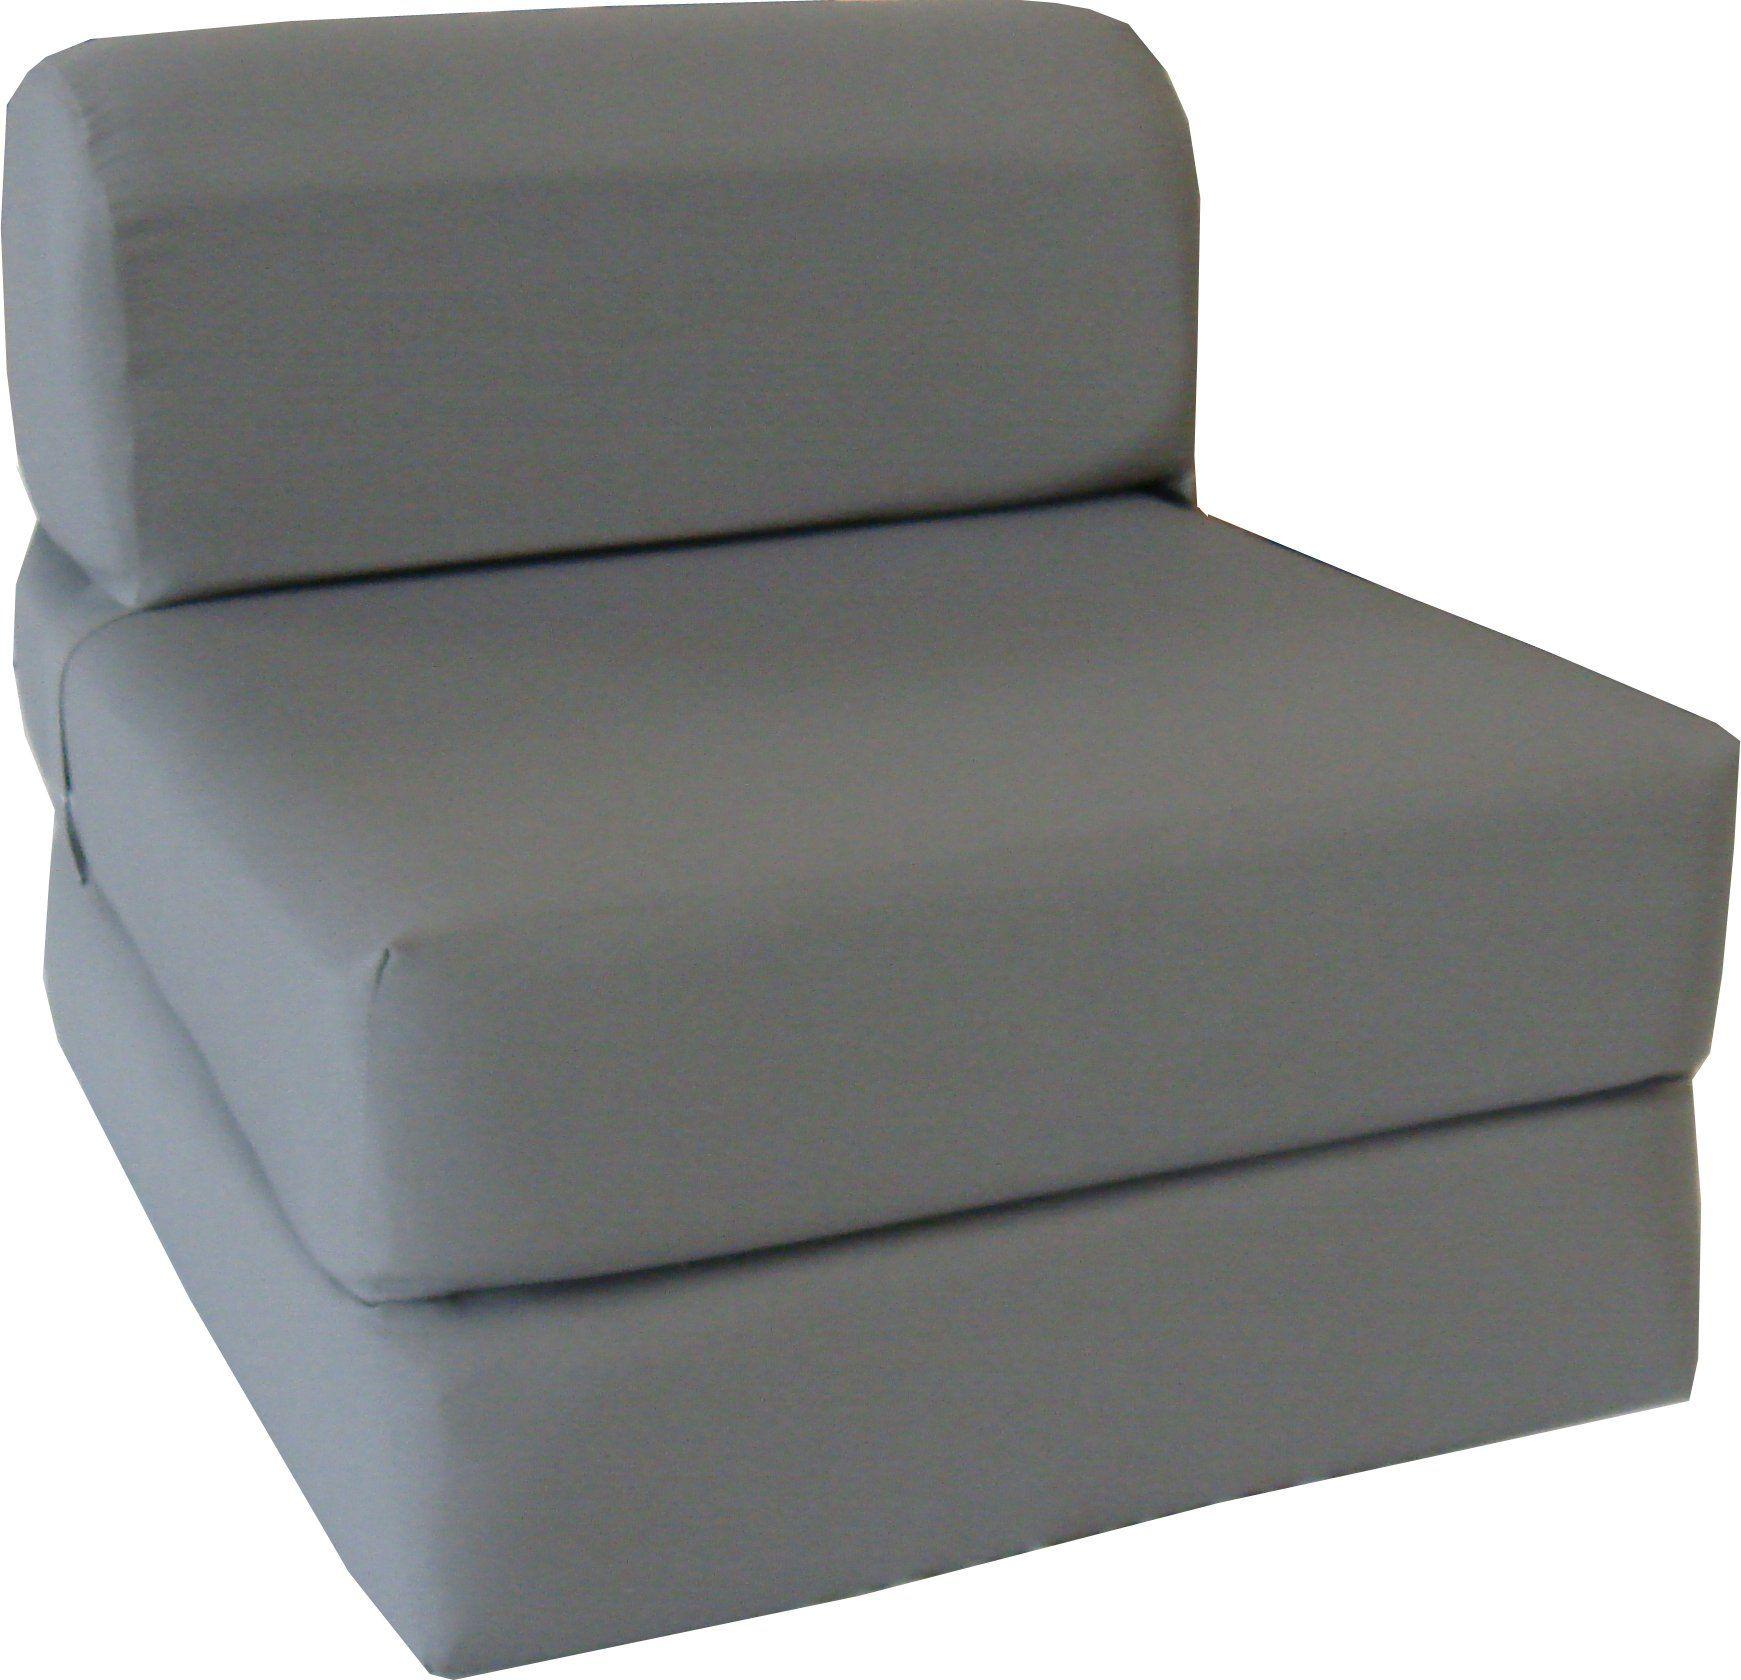 "Amazon Gray Sleeper Chair Folding Foam Bed Sized 6"" Thick X"